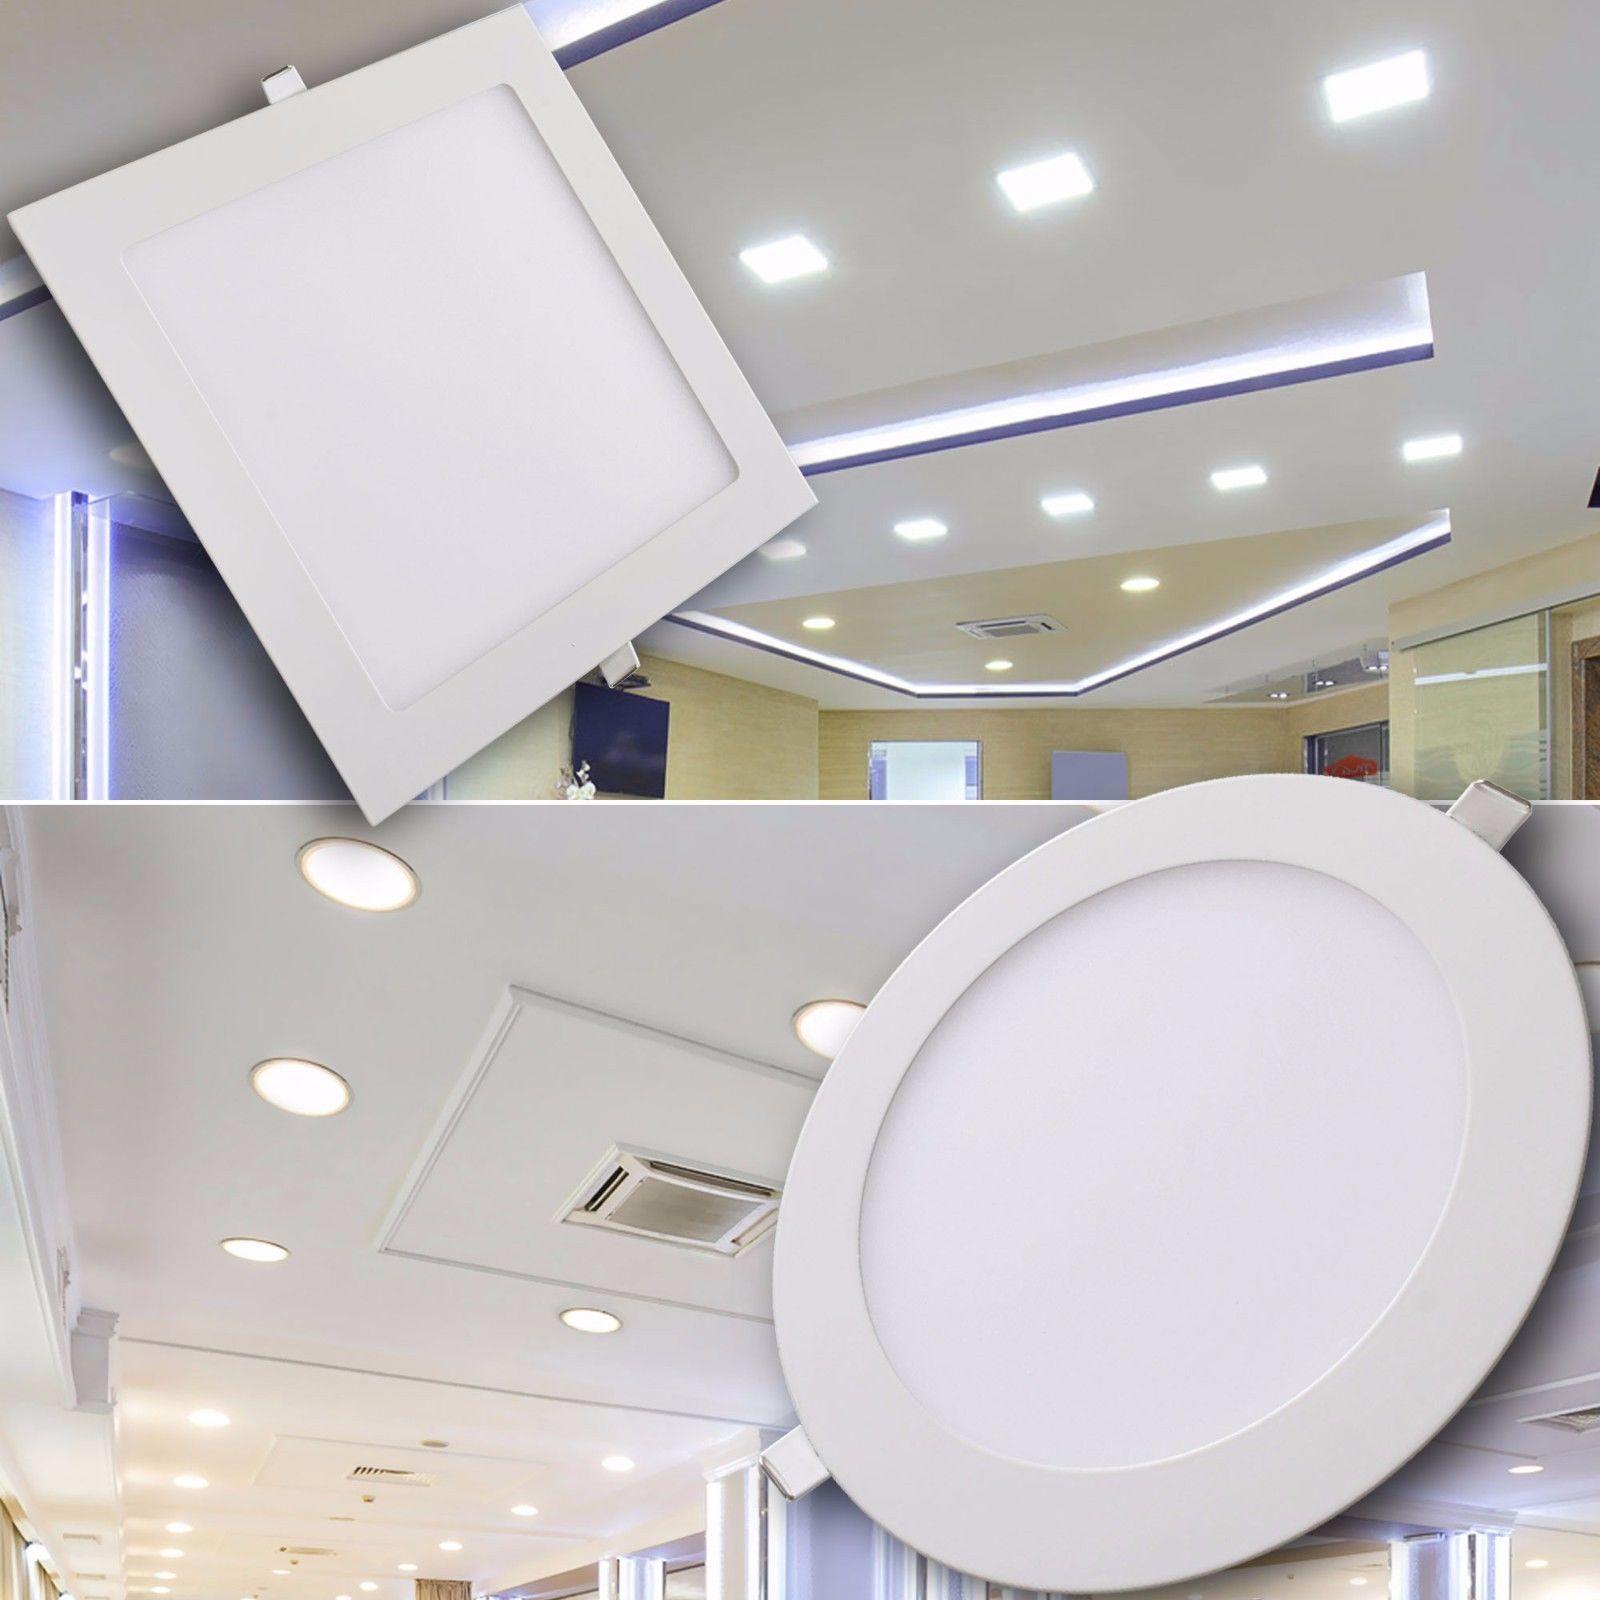 Led Panel Einbaustrahler Einbauspot 4w 6w 12w 18w Deckenlampe Lampe Spot Ebay Iluminacion Con Led Lamparas Para Comedor Lampara Led